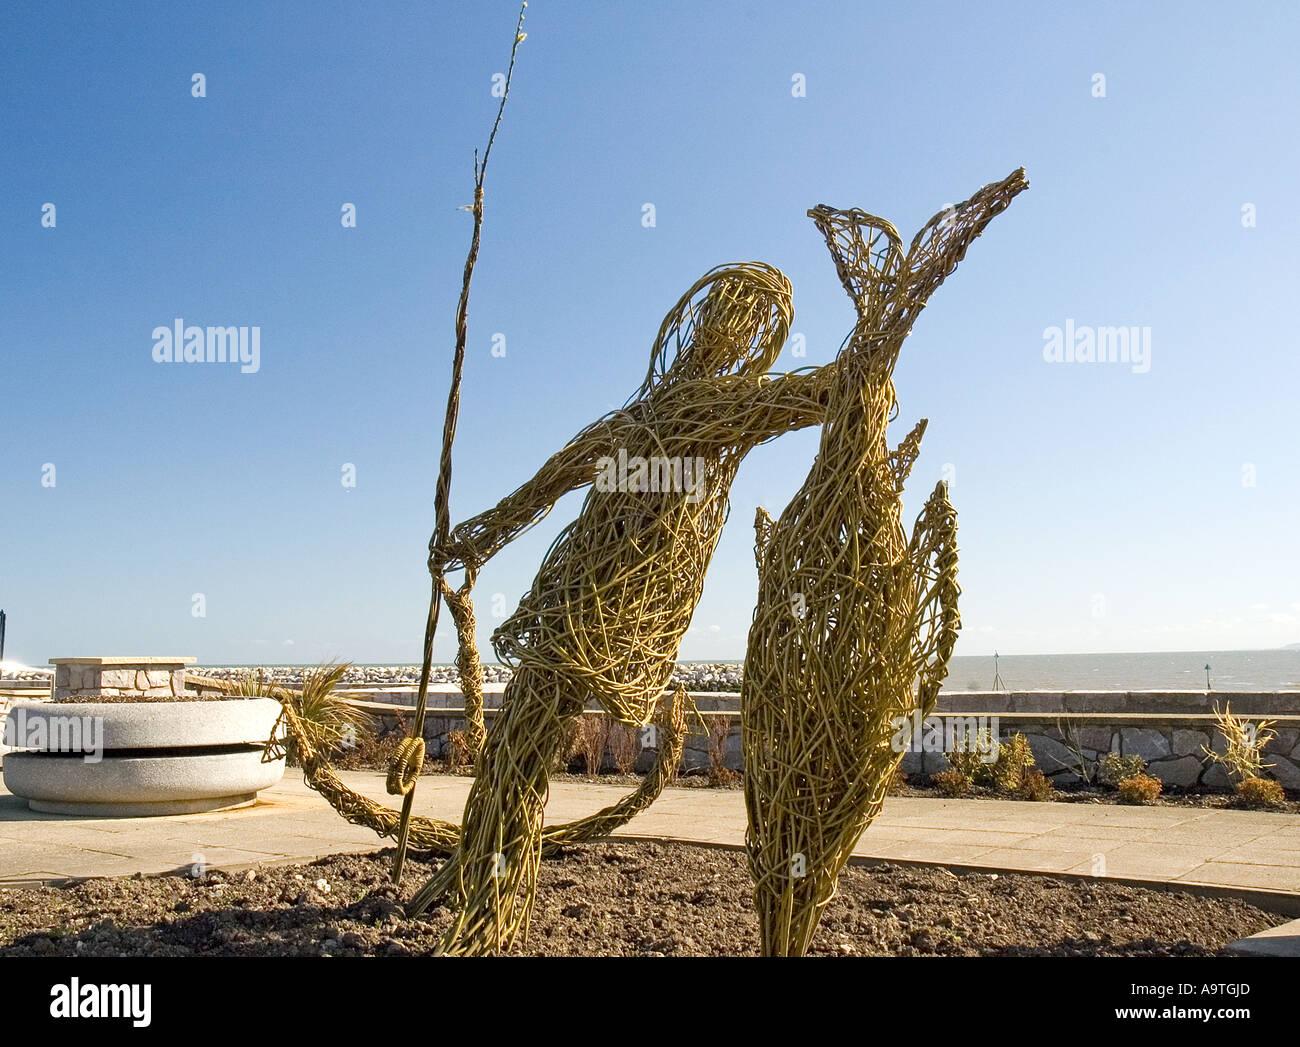 Wicker Statue, Rhos on Sea Promenade, Colwyn Bay, Conwy, North East Wales - Stock Image